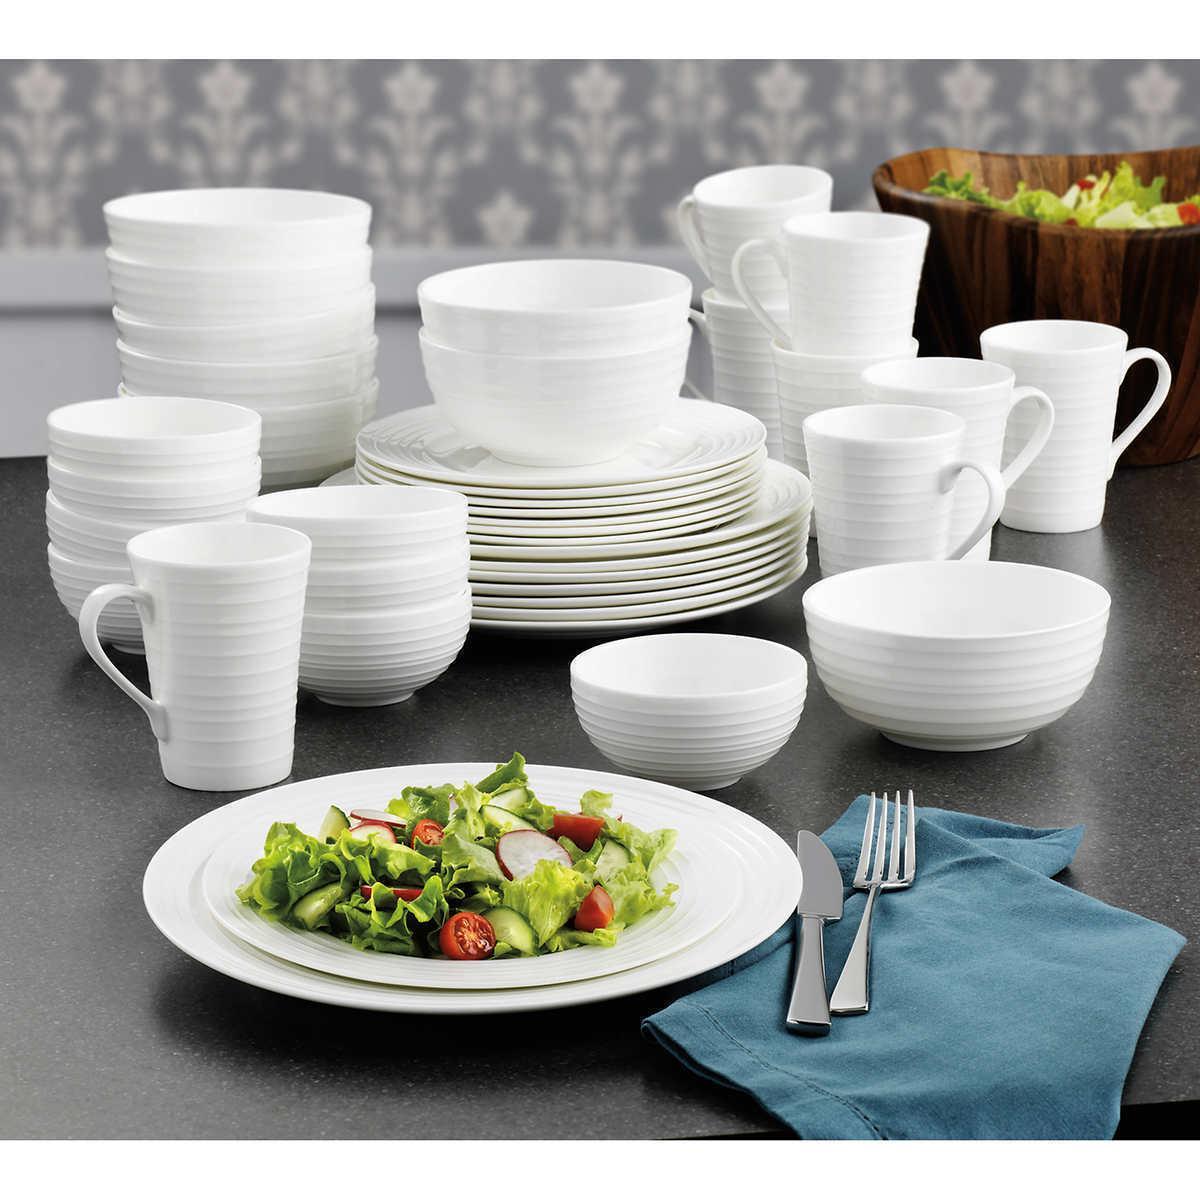 Mikasa Stanton 40 Piece Dinnerware Set, Service for 8, White